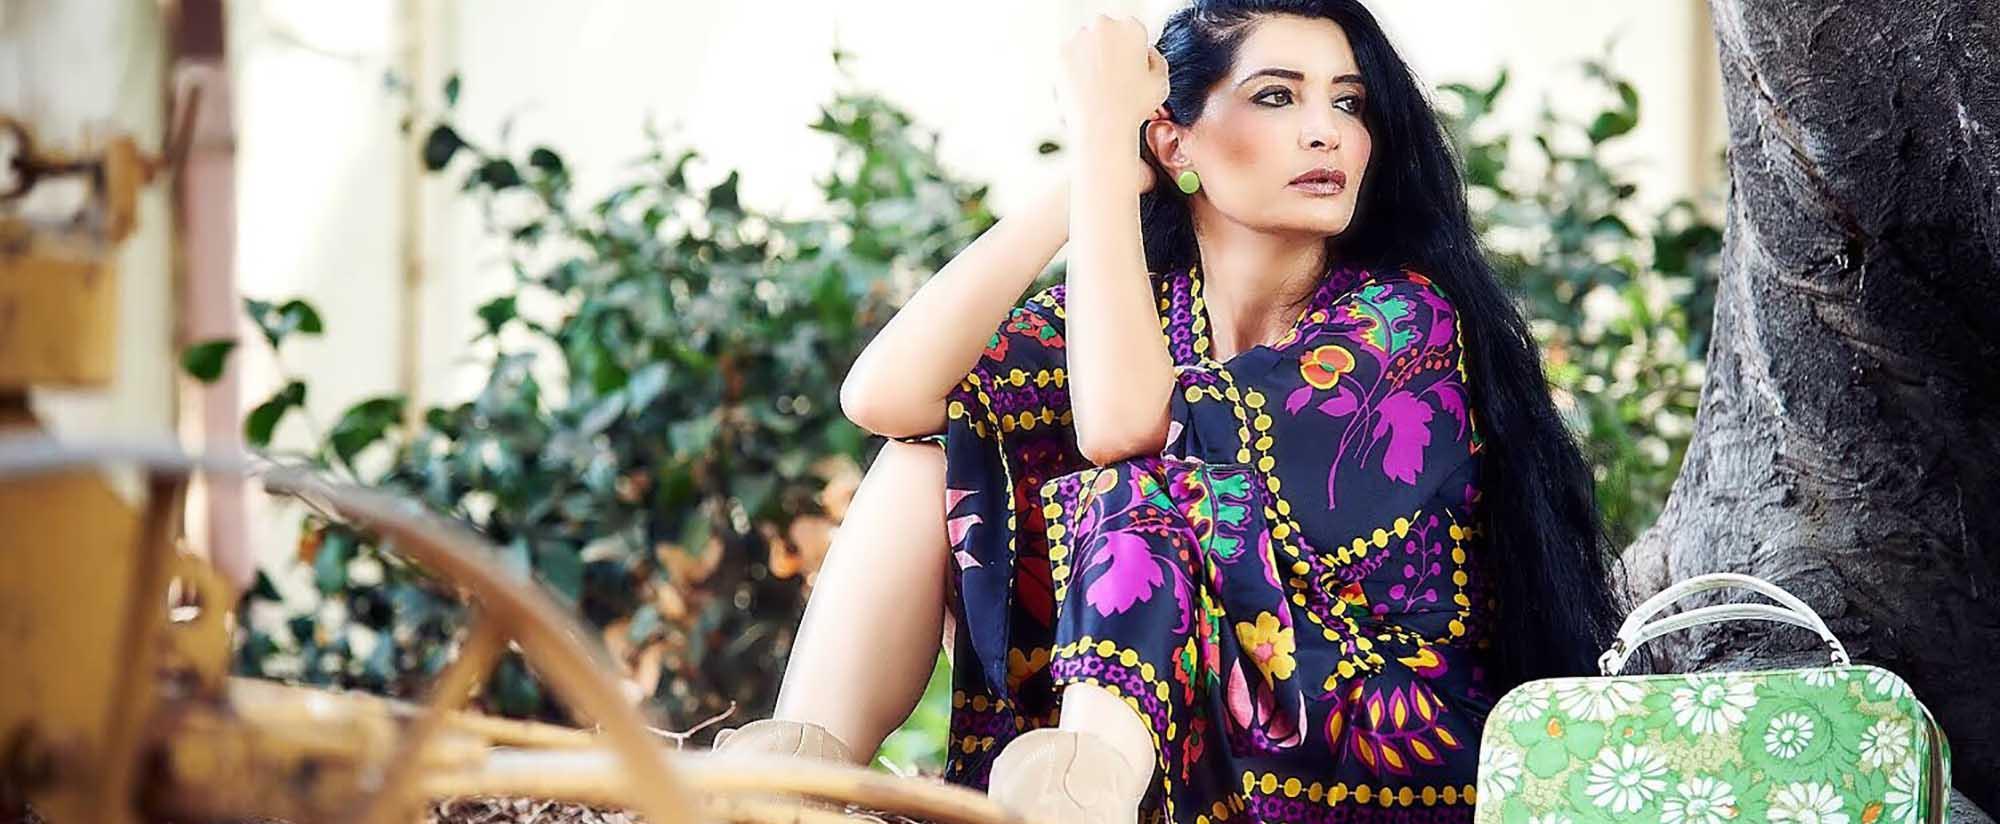 Fashion Israel-מגזין אופנה ישראלי, סטיילינג לובשת וינטג צילום kim kandler -21